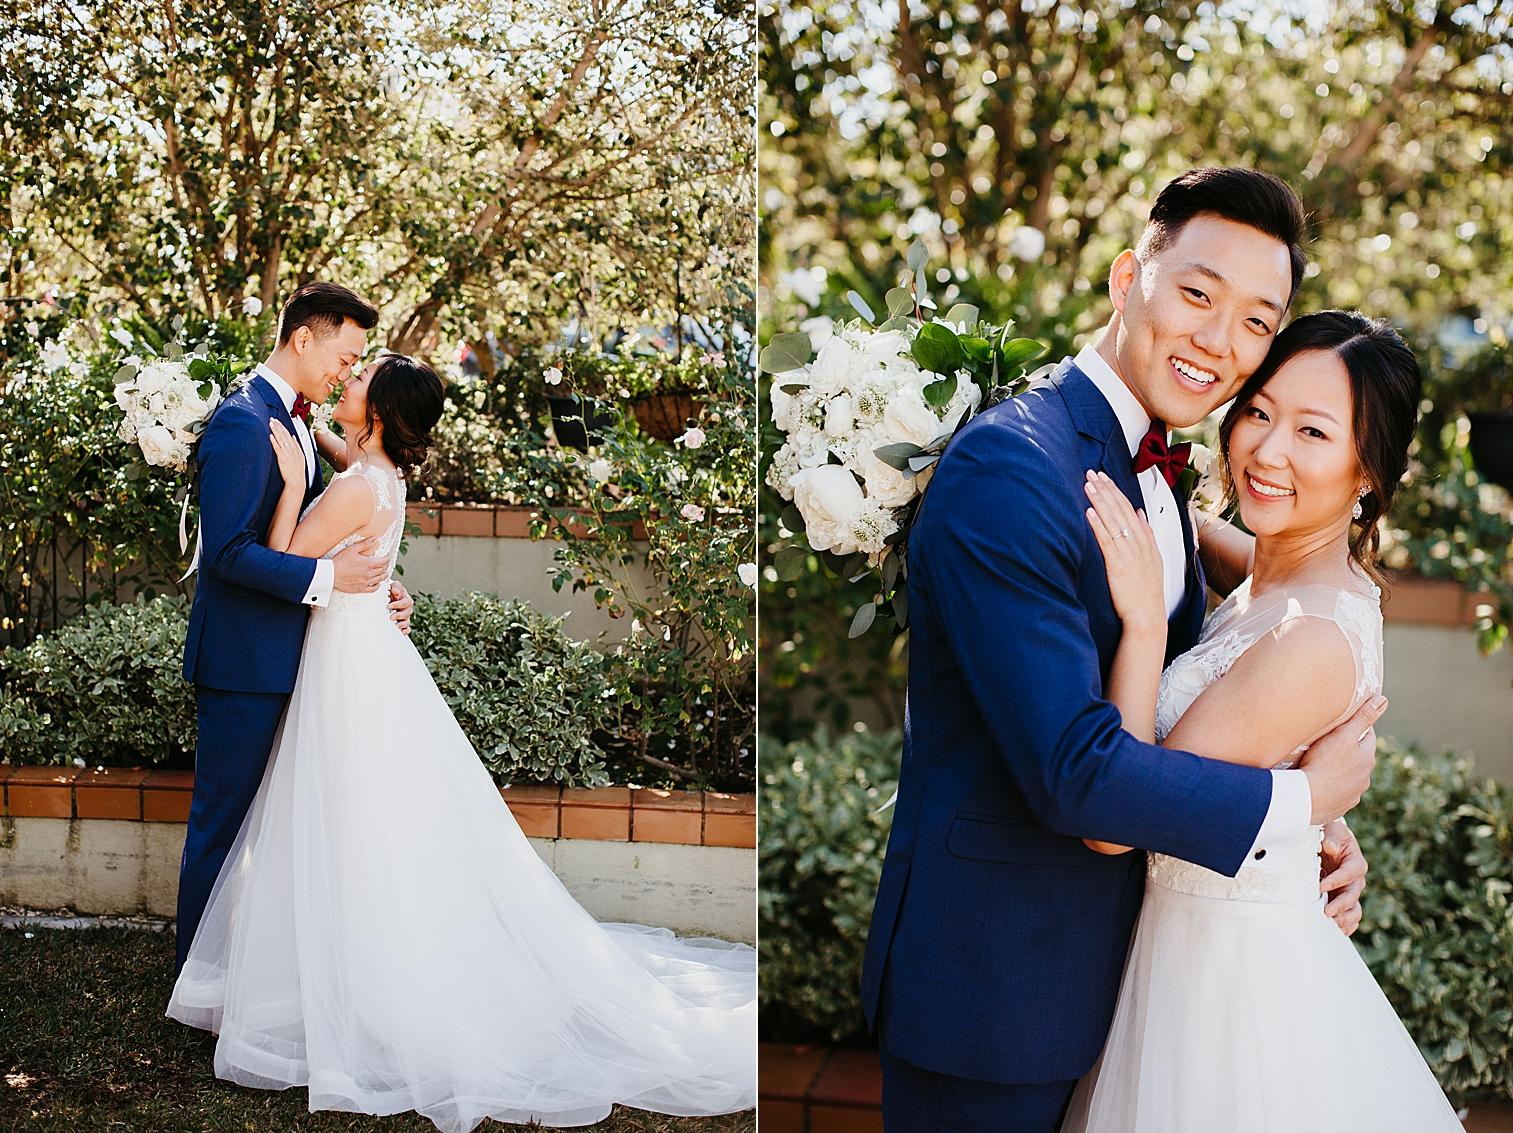 Secret-Garden-Rancho-Santa-Fe-Wedding-38.jpg